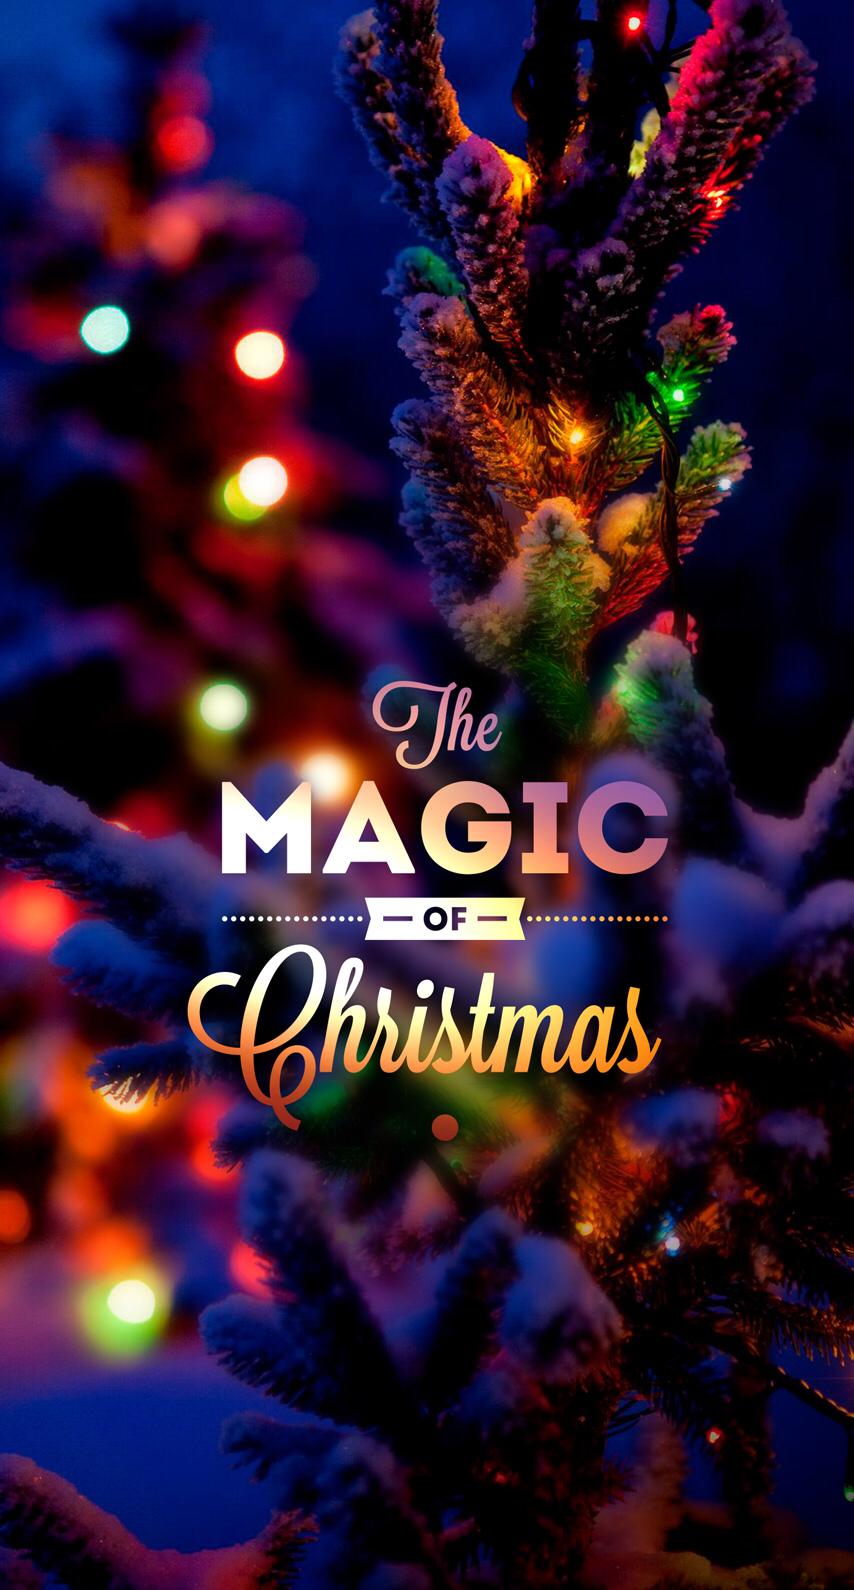 Best Christmas Powerpoint Template Christmas Wallpaper Merry Christmas Wallpaper Christmas Phone Wallpaper